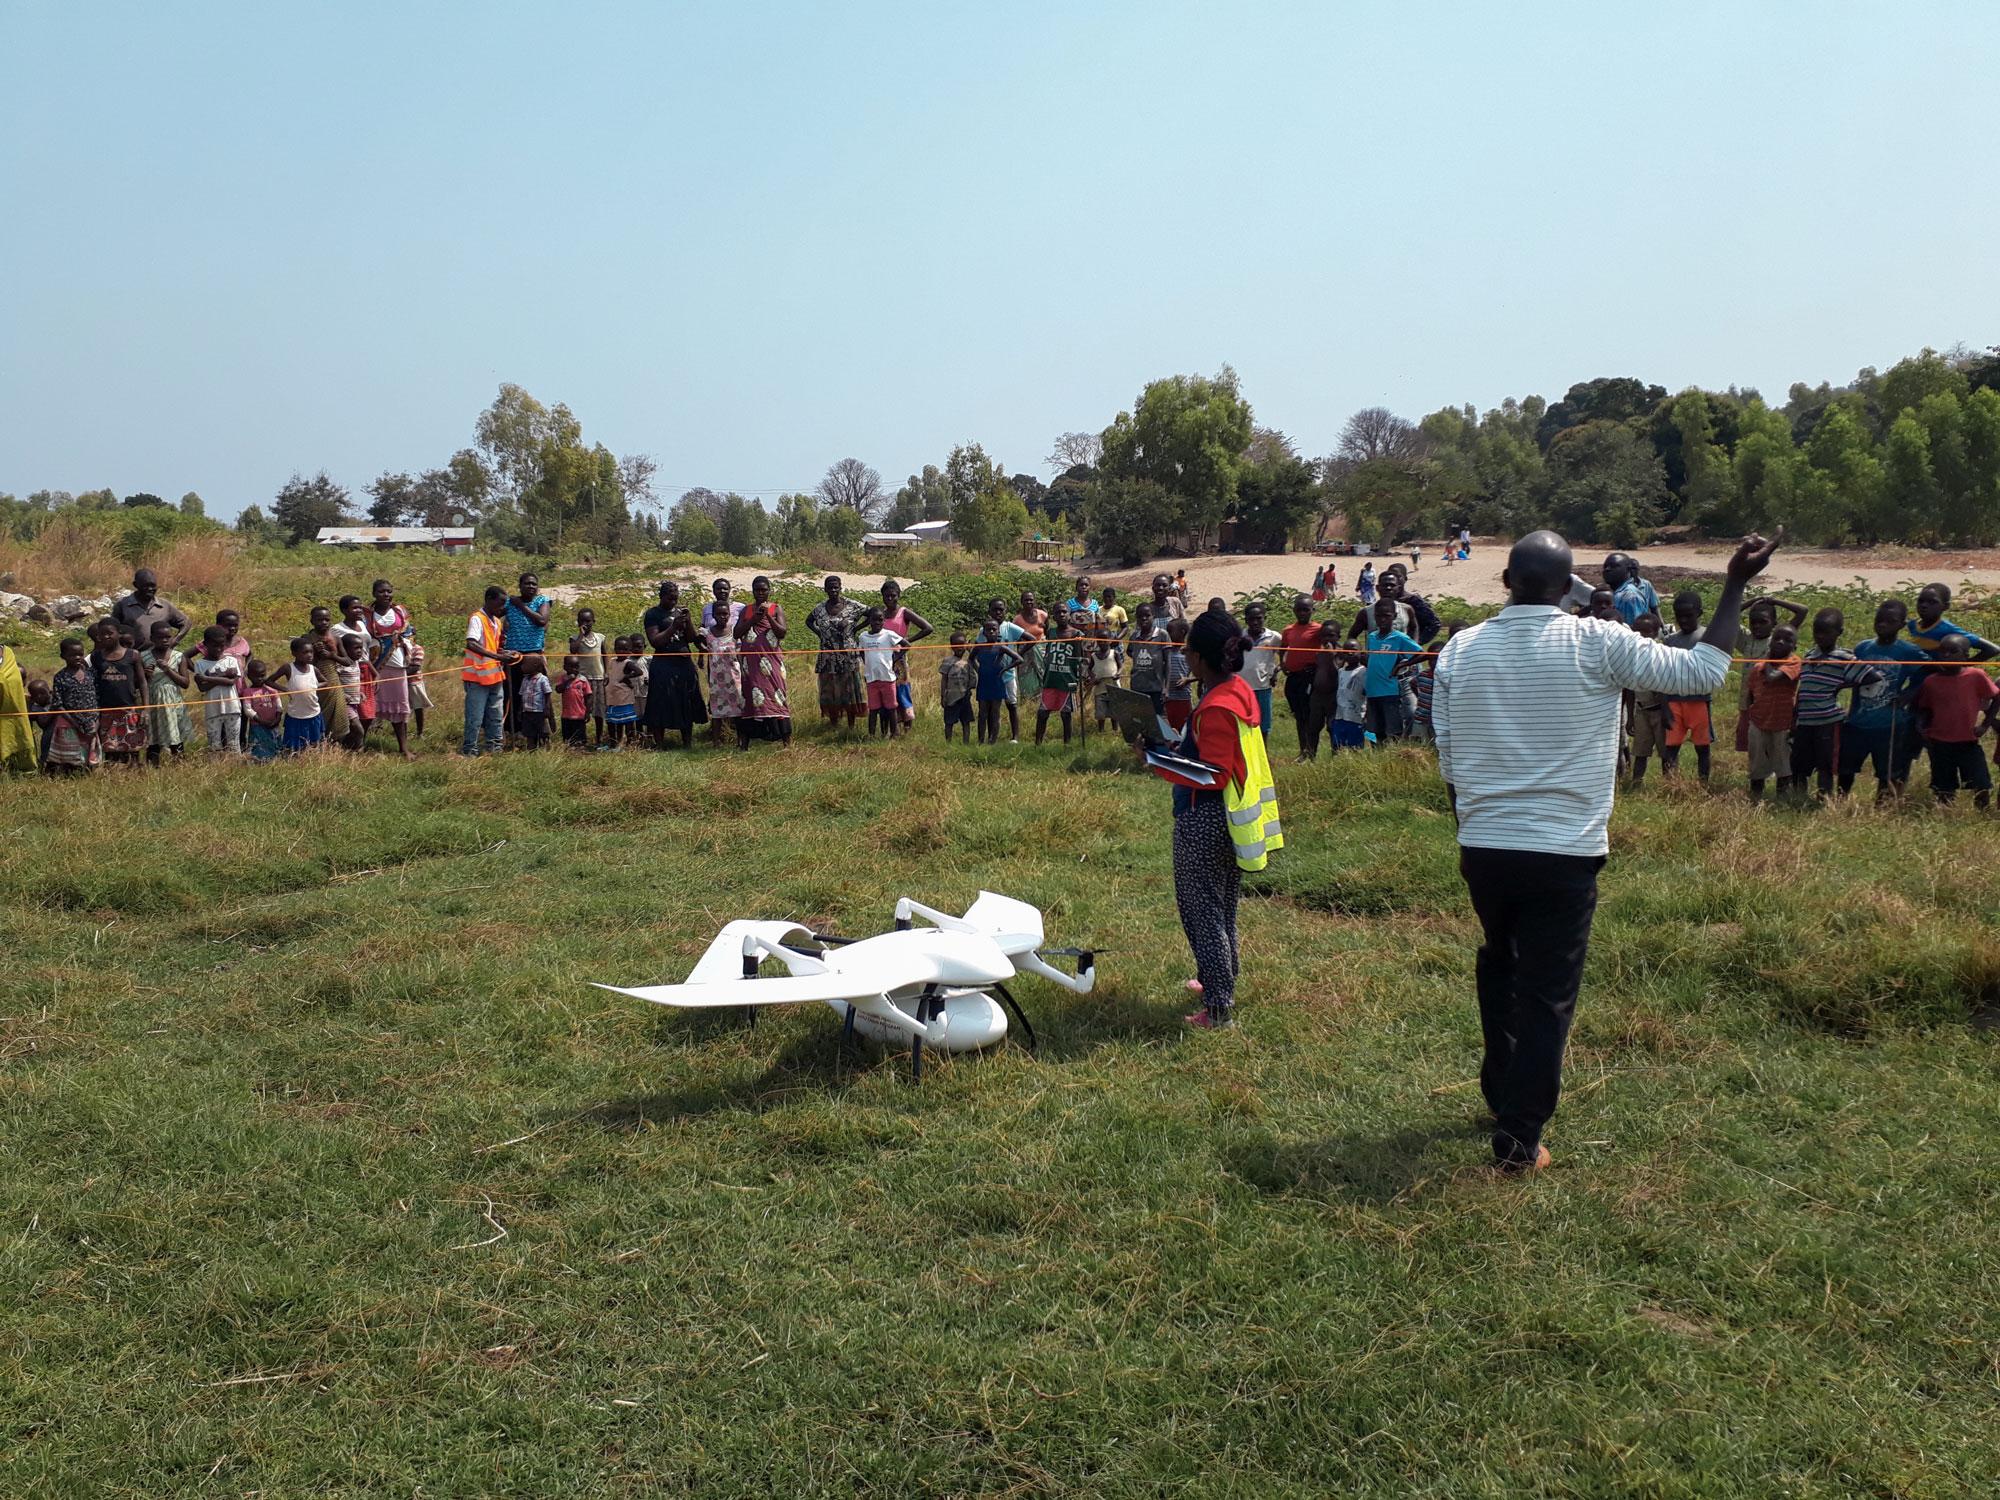 Wingcopter_Malawi_bea-10-bea